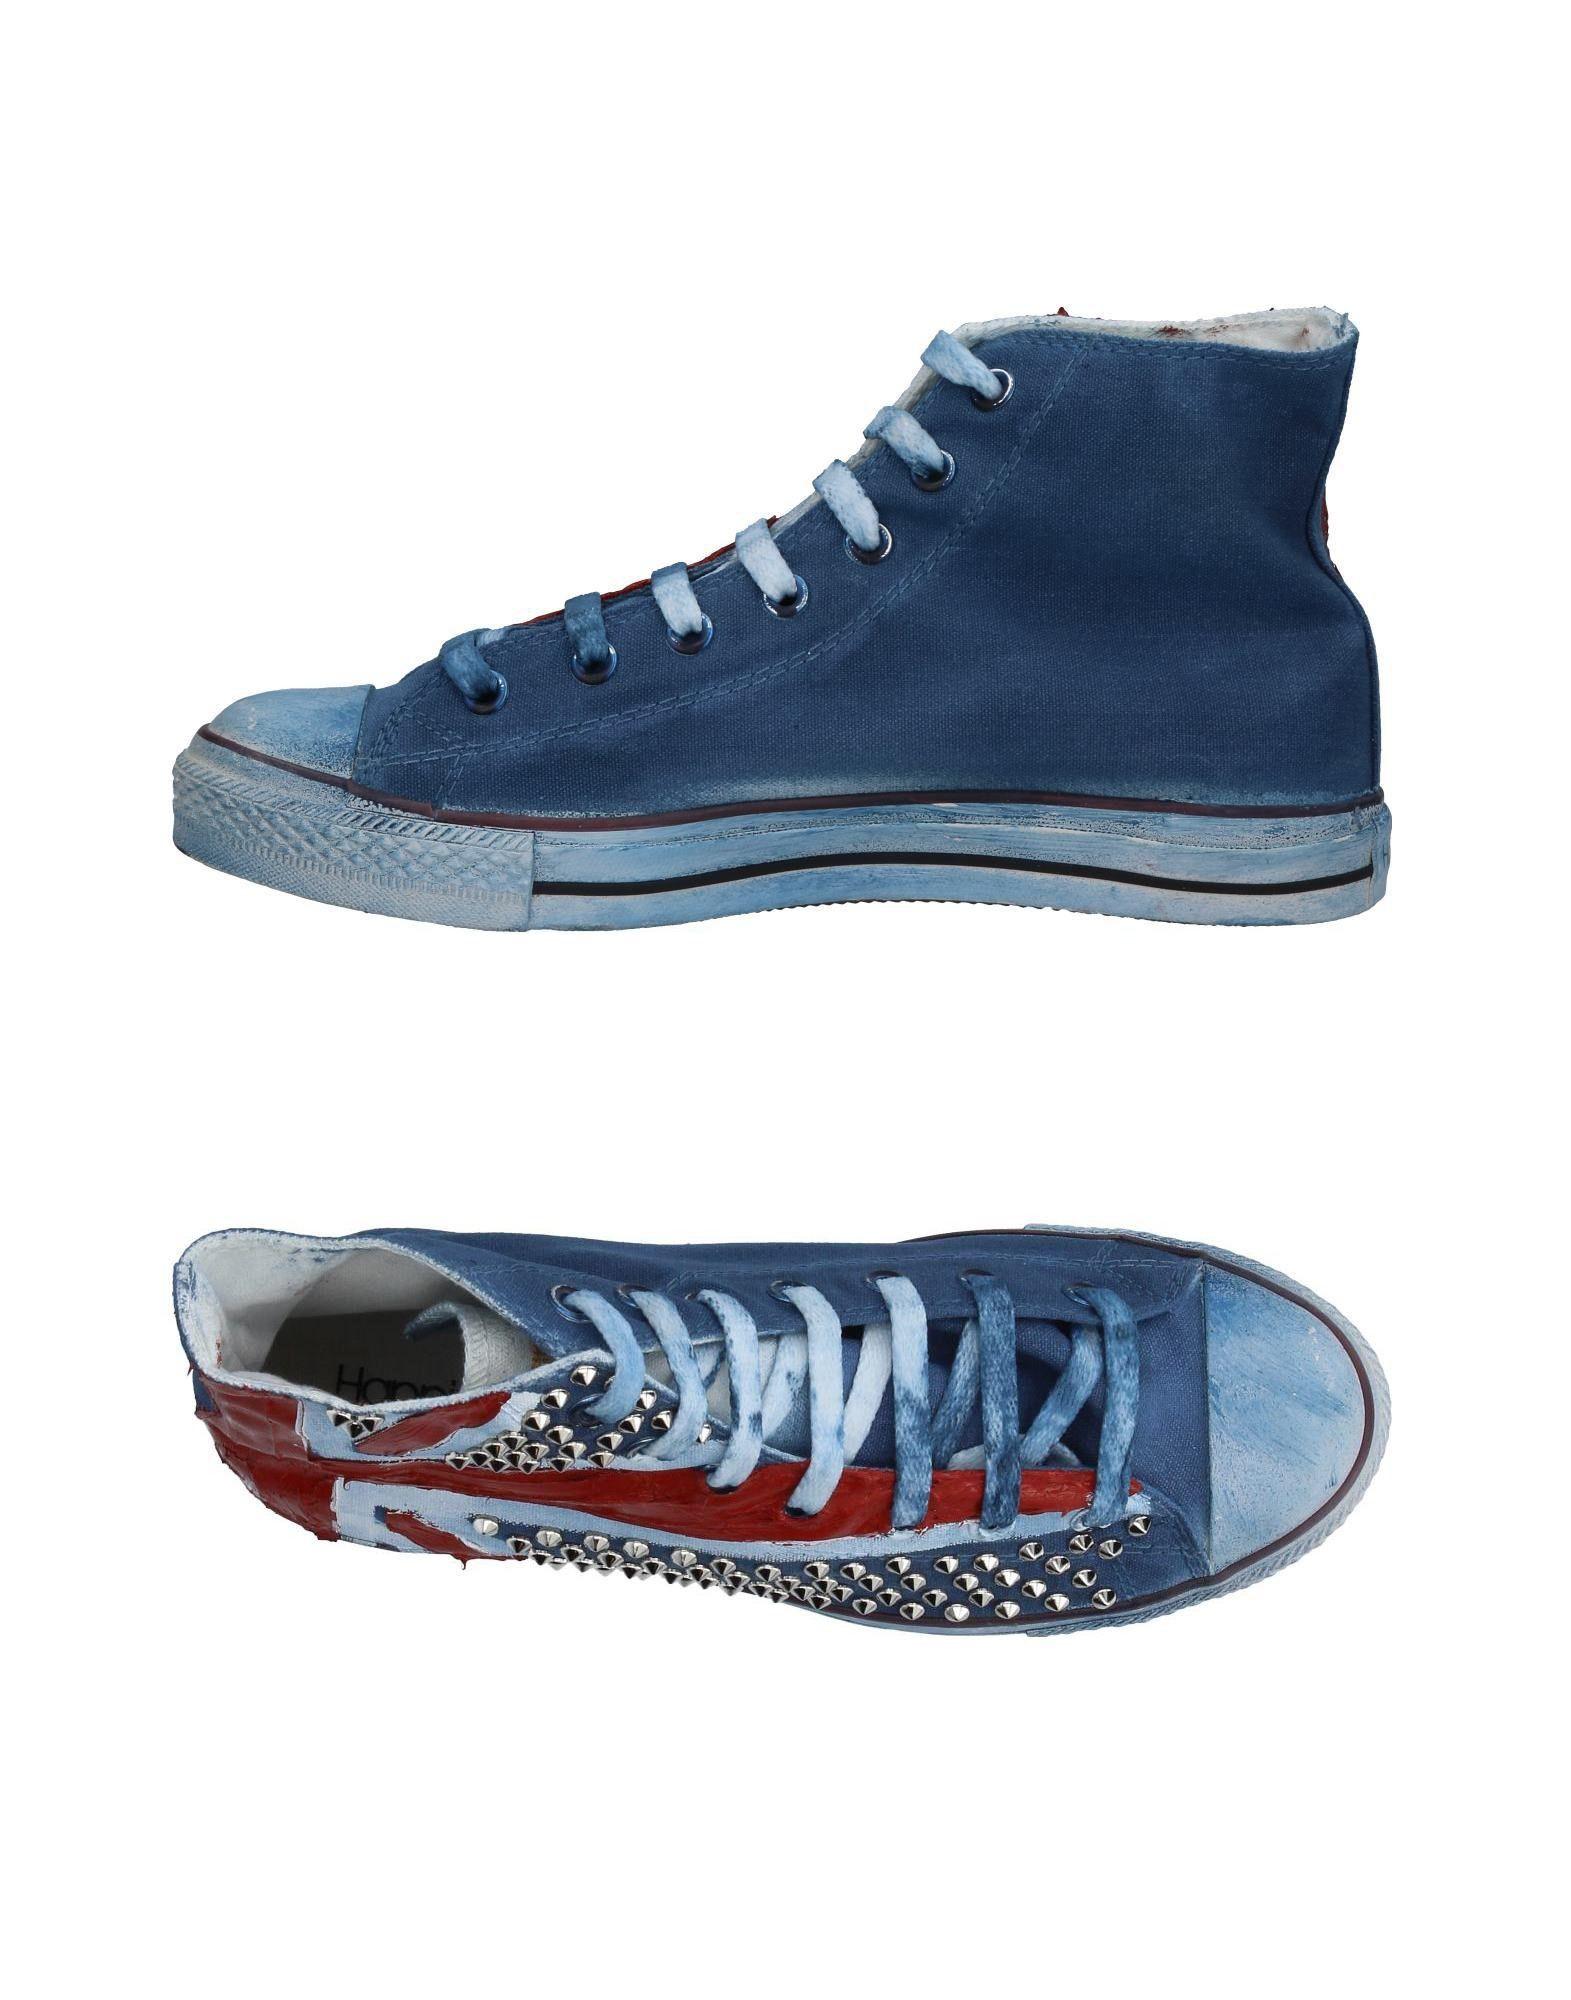 HAPPINESS Высокие кеды и кроссовки кеды кроссовки высокие dc council mid tx stone camo